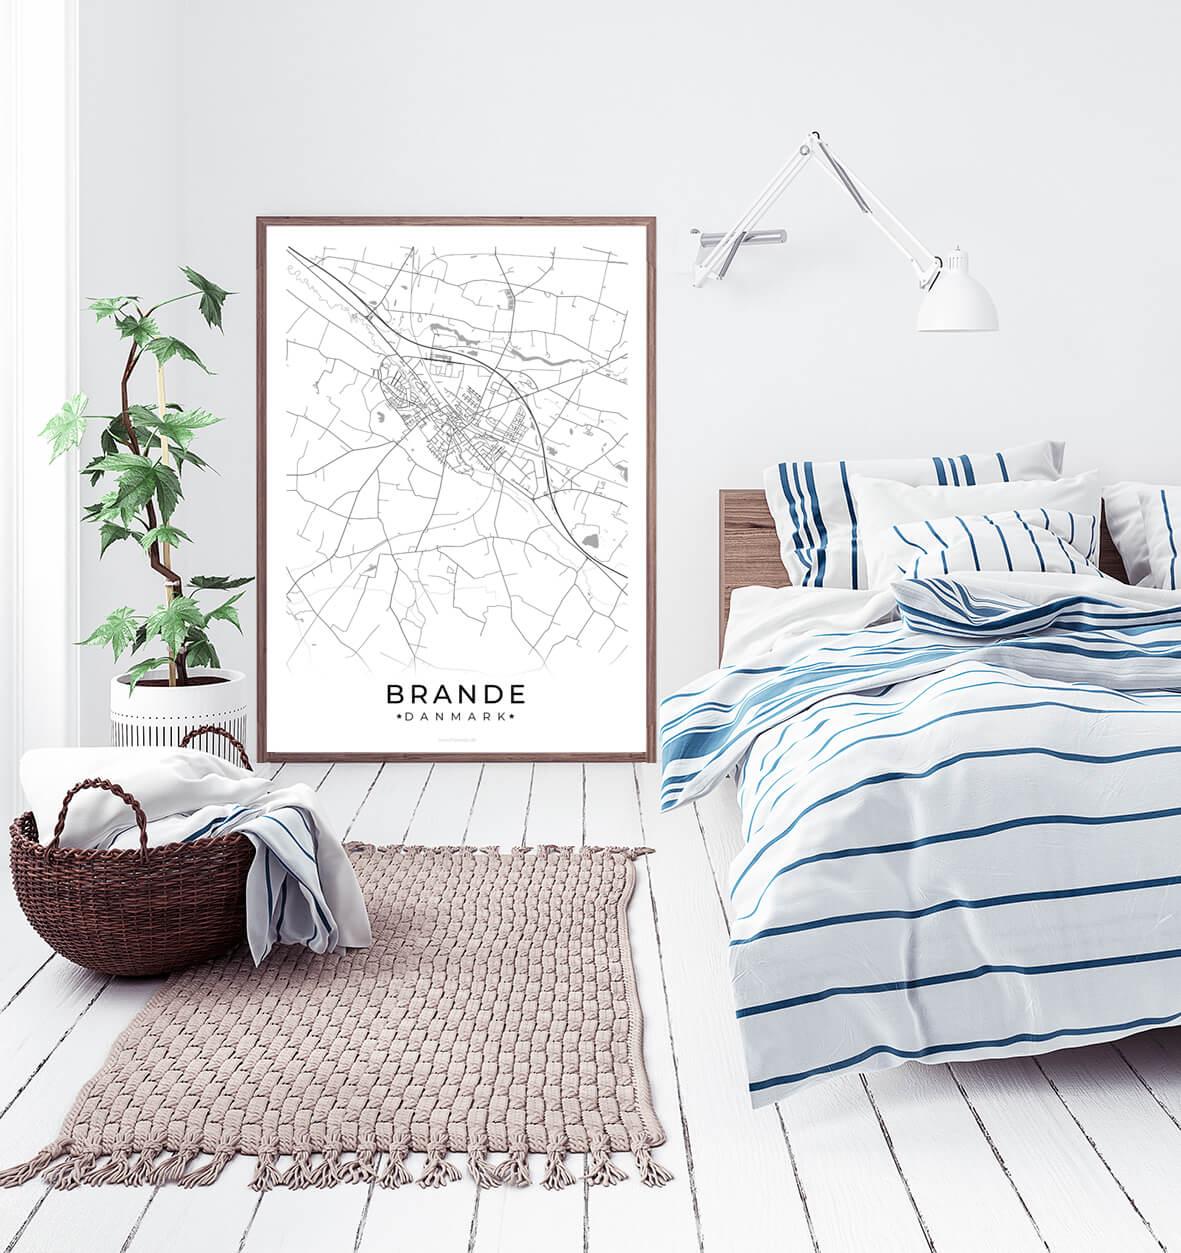 Brande-hvid-byplakat-2